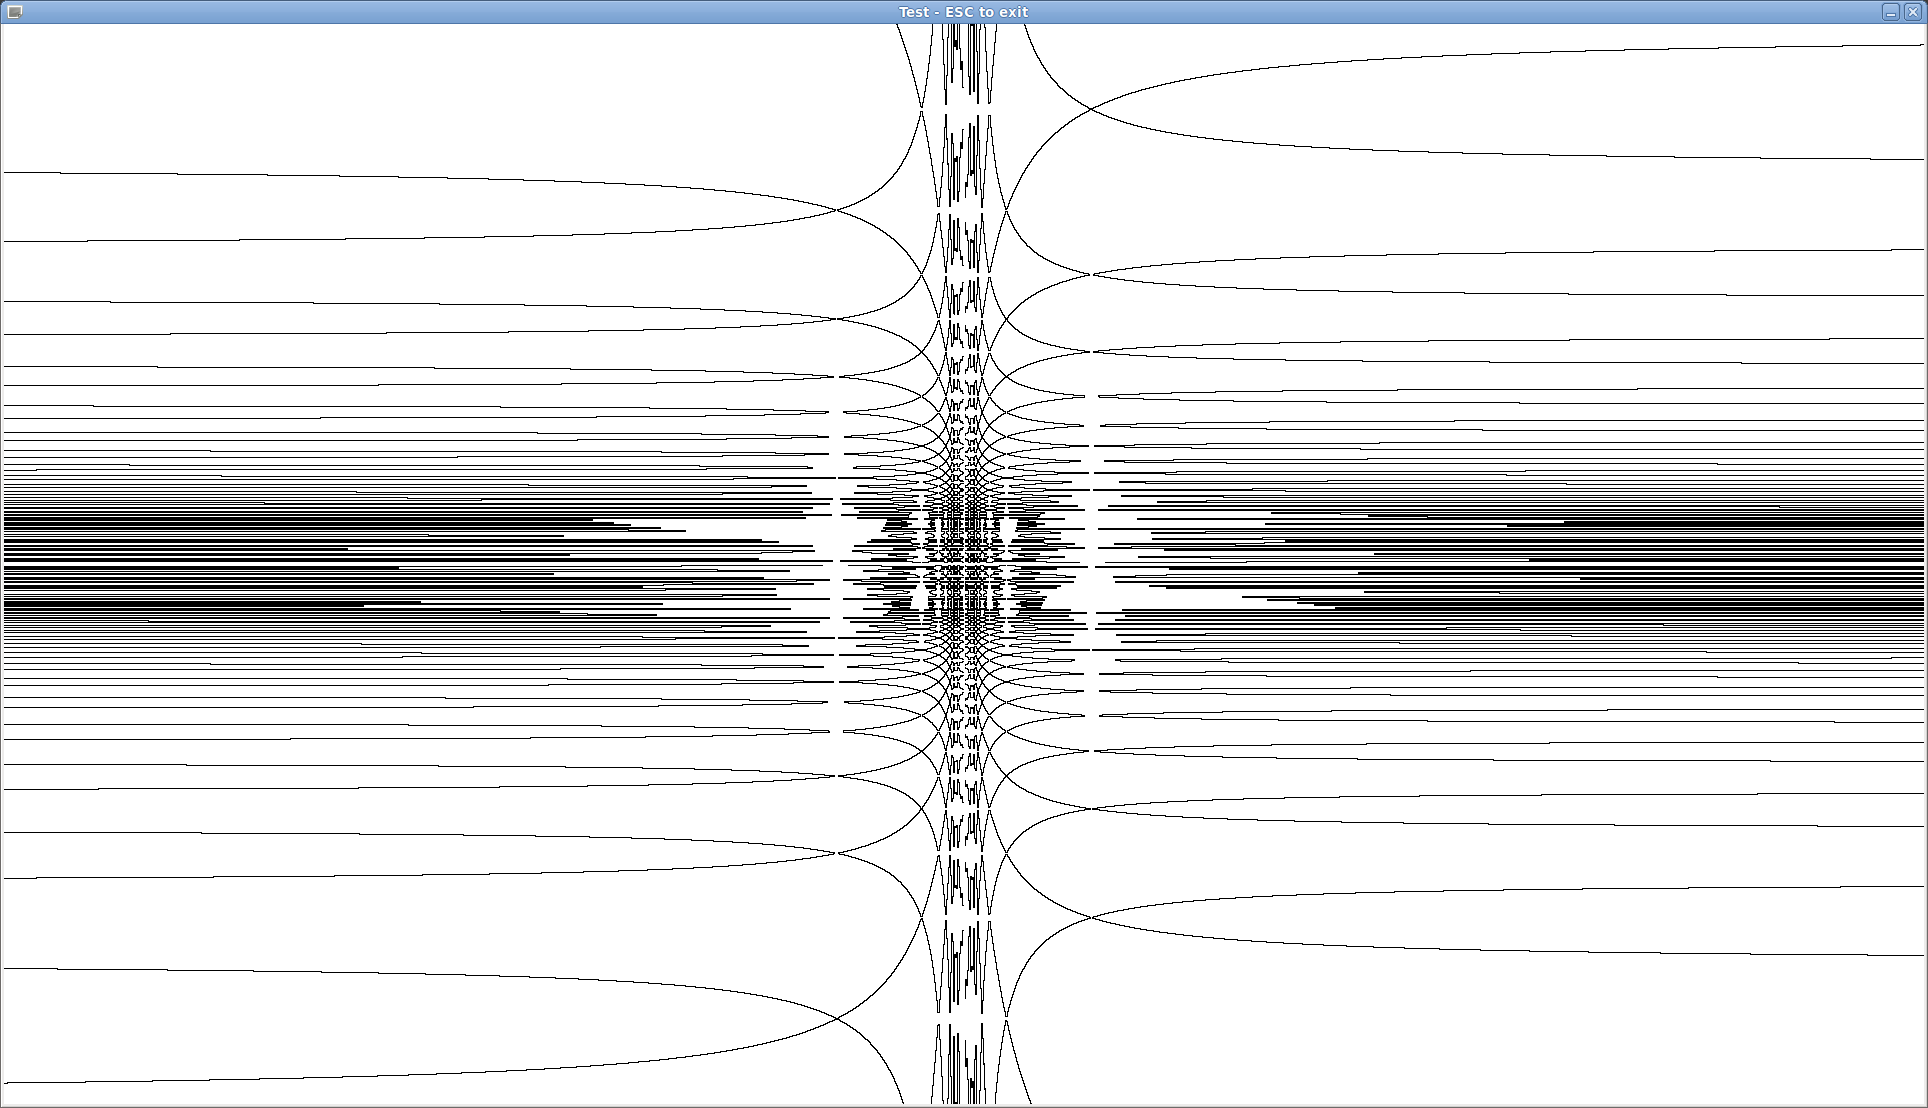 lattice 2x2, rendered in  0.43s